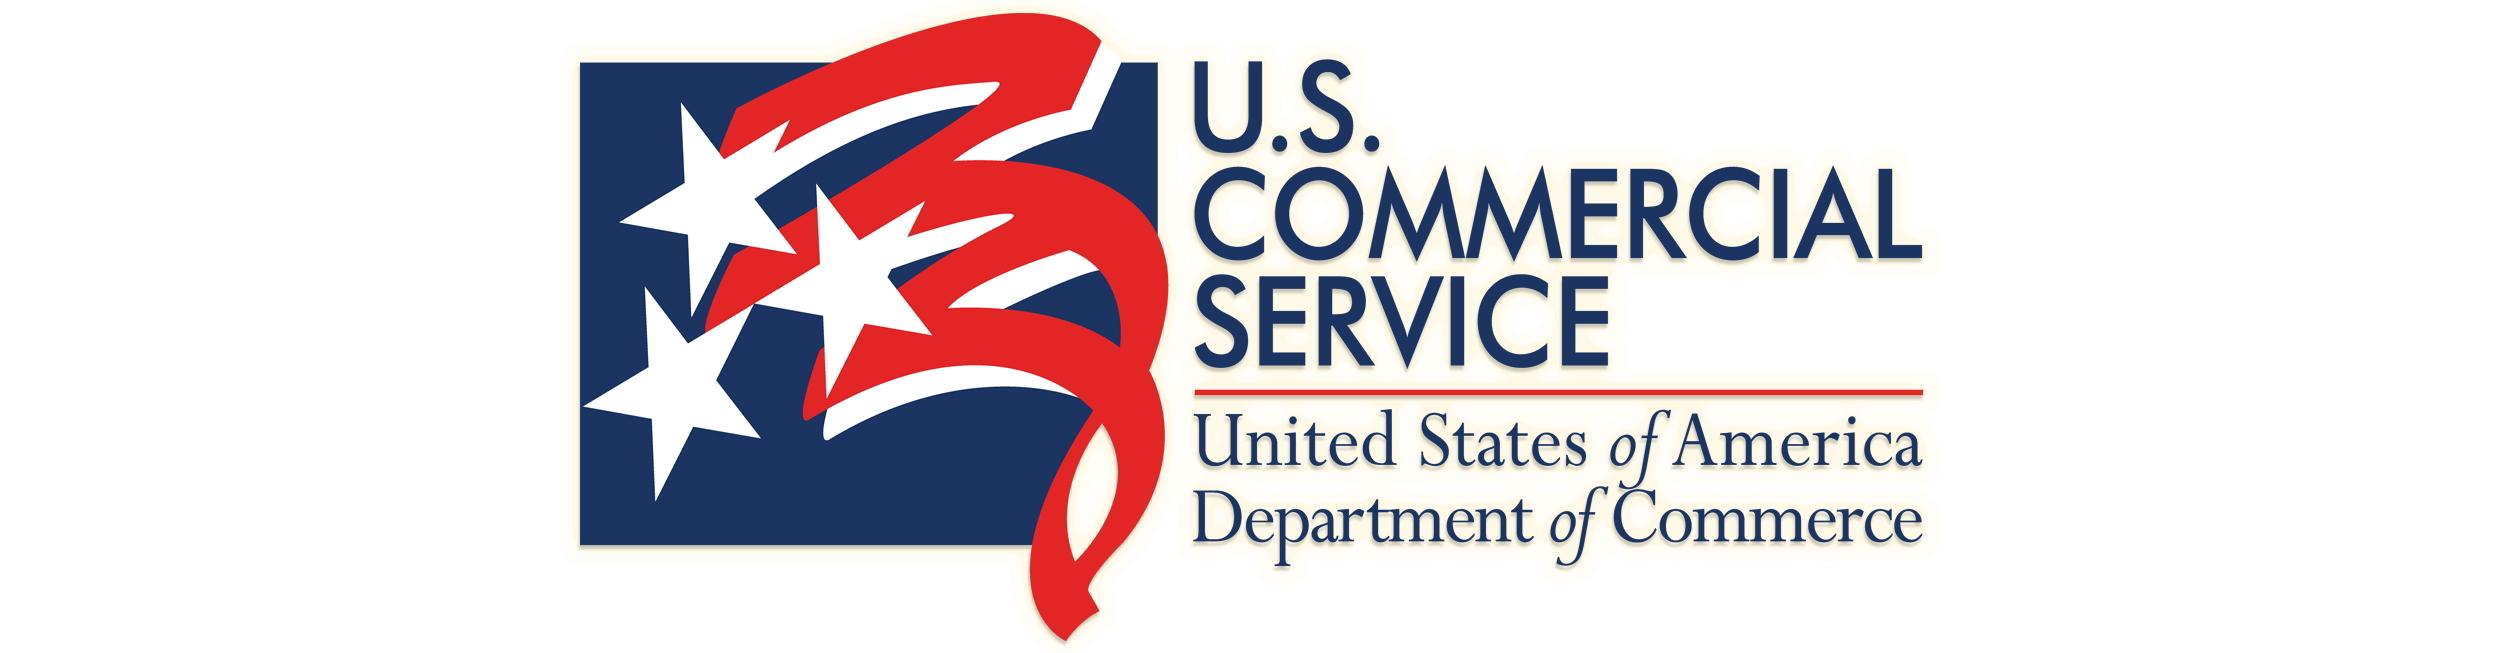 HUGE-E TOP USCS logo header